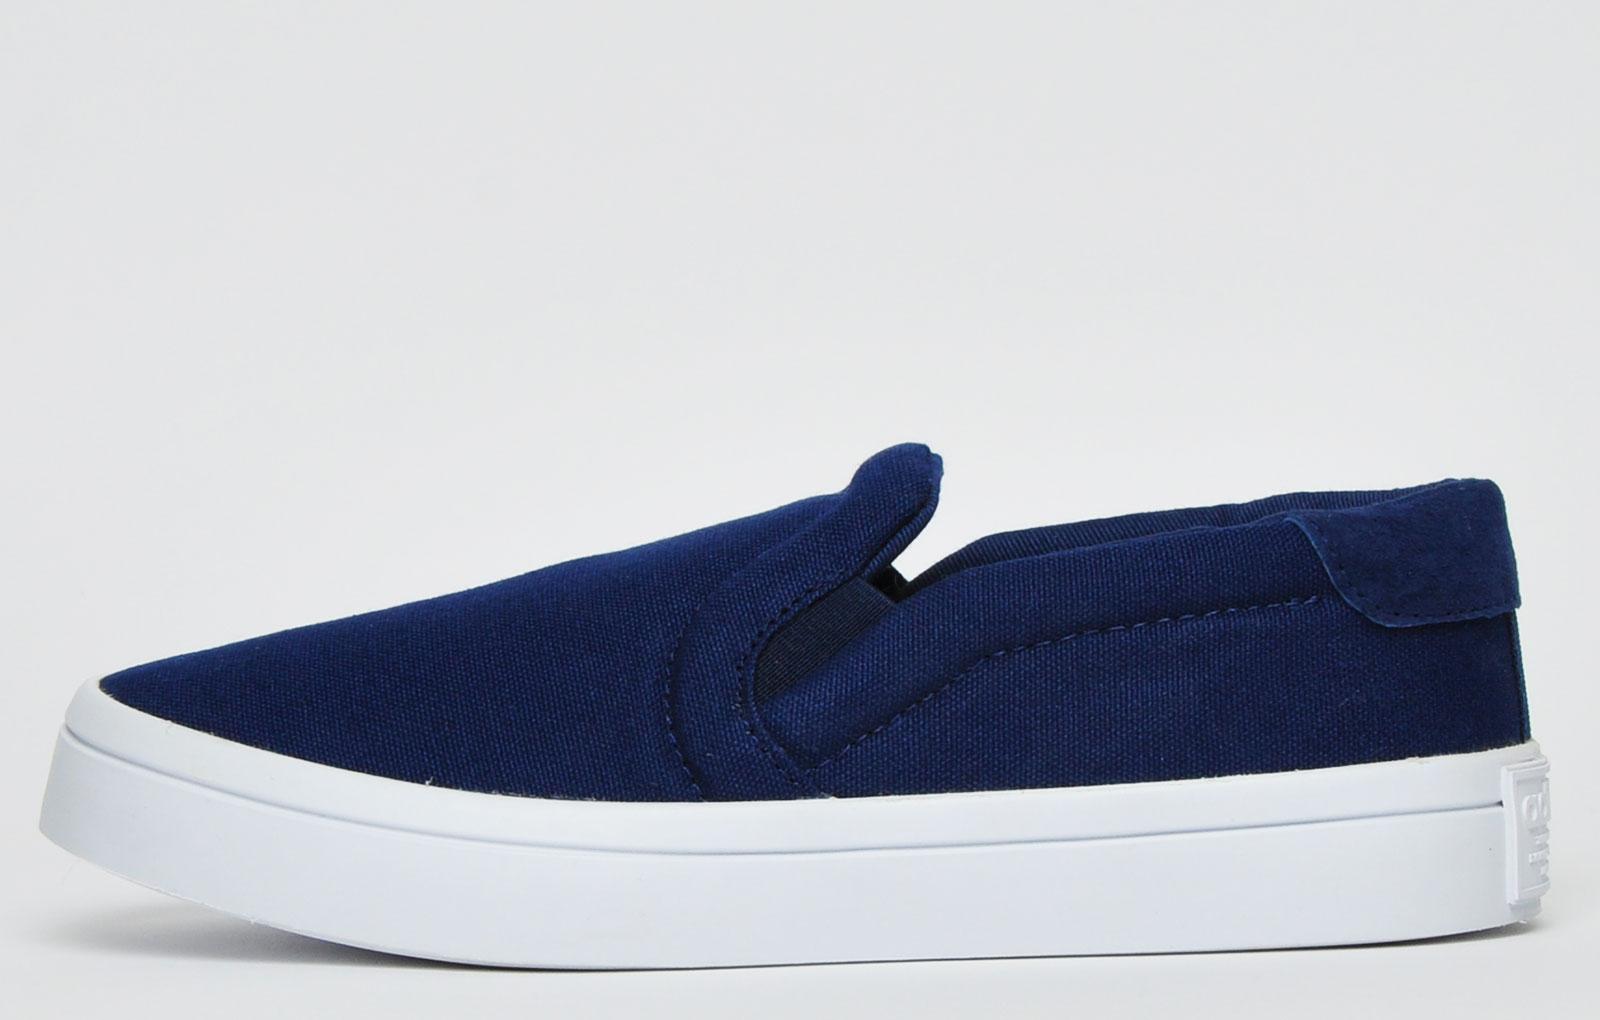 Adidas Originals Court Vantage Slip On